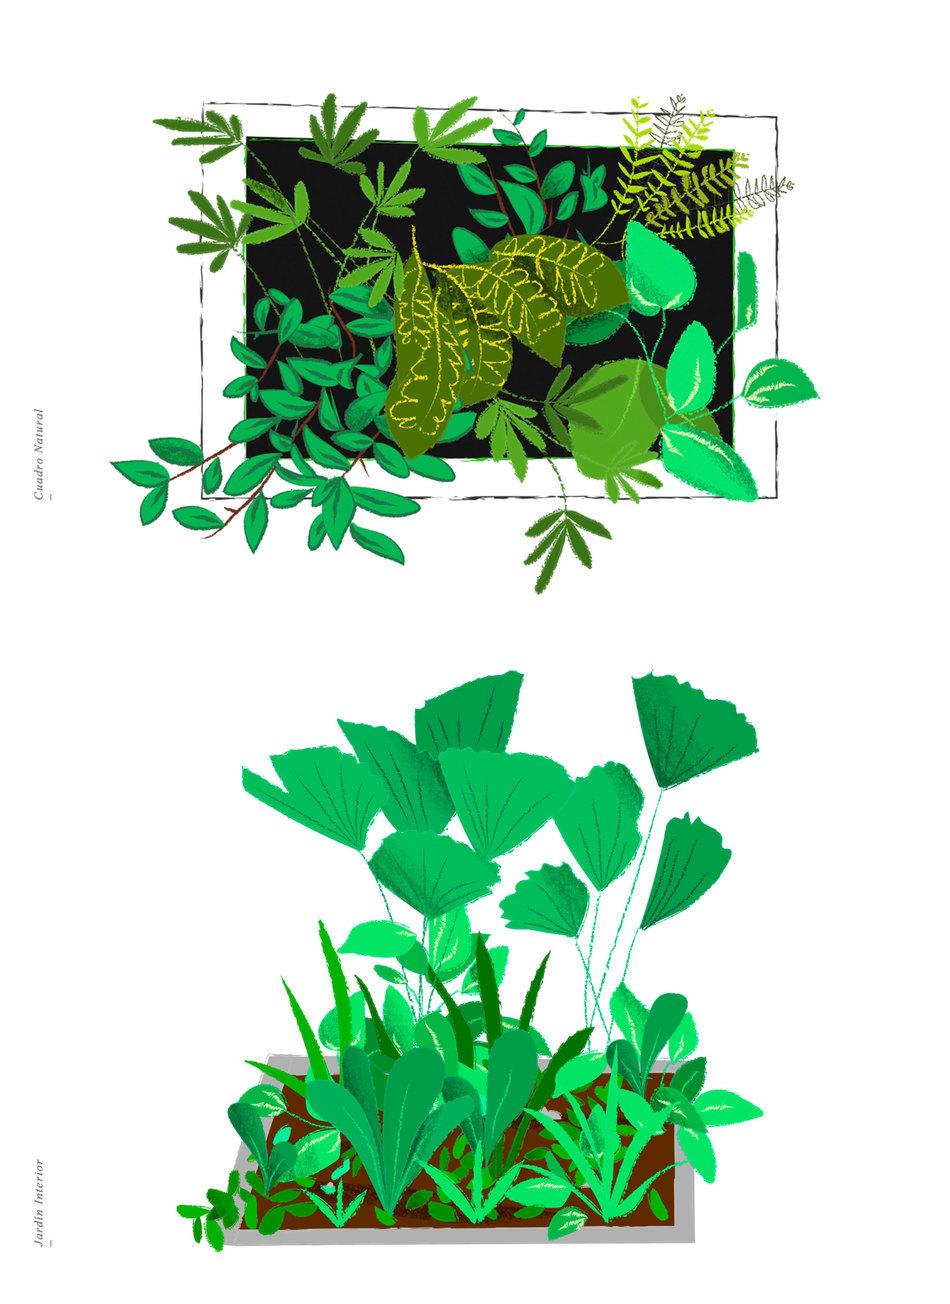 Intgarden by Fabiola Correas - Creative Work